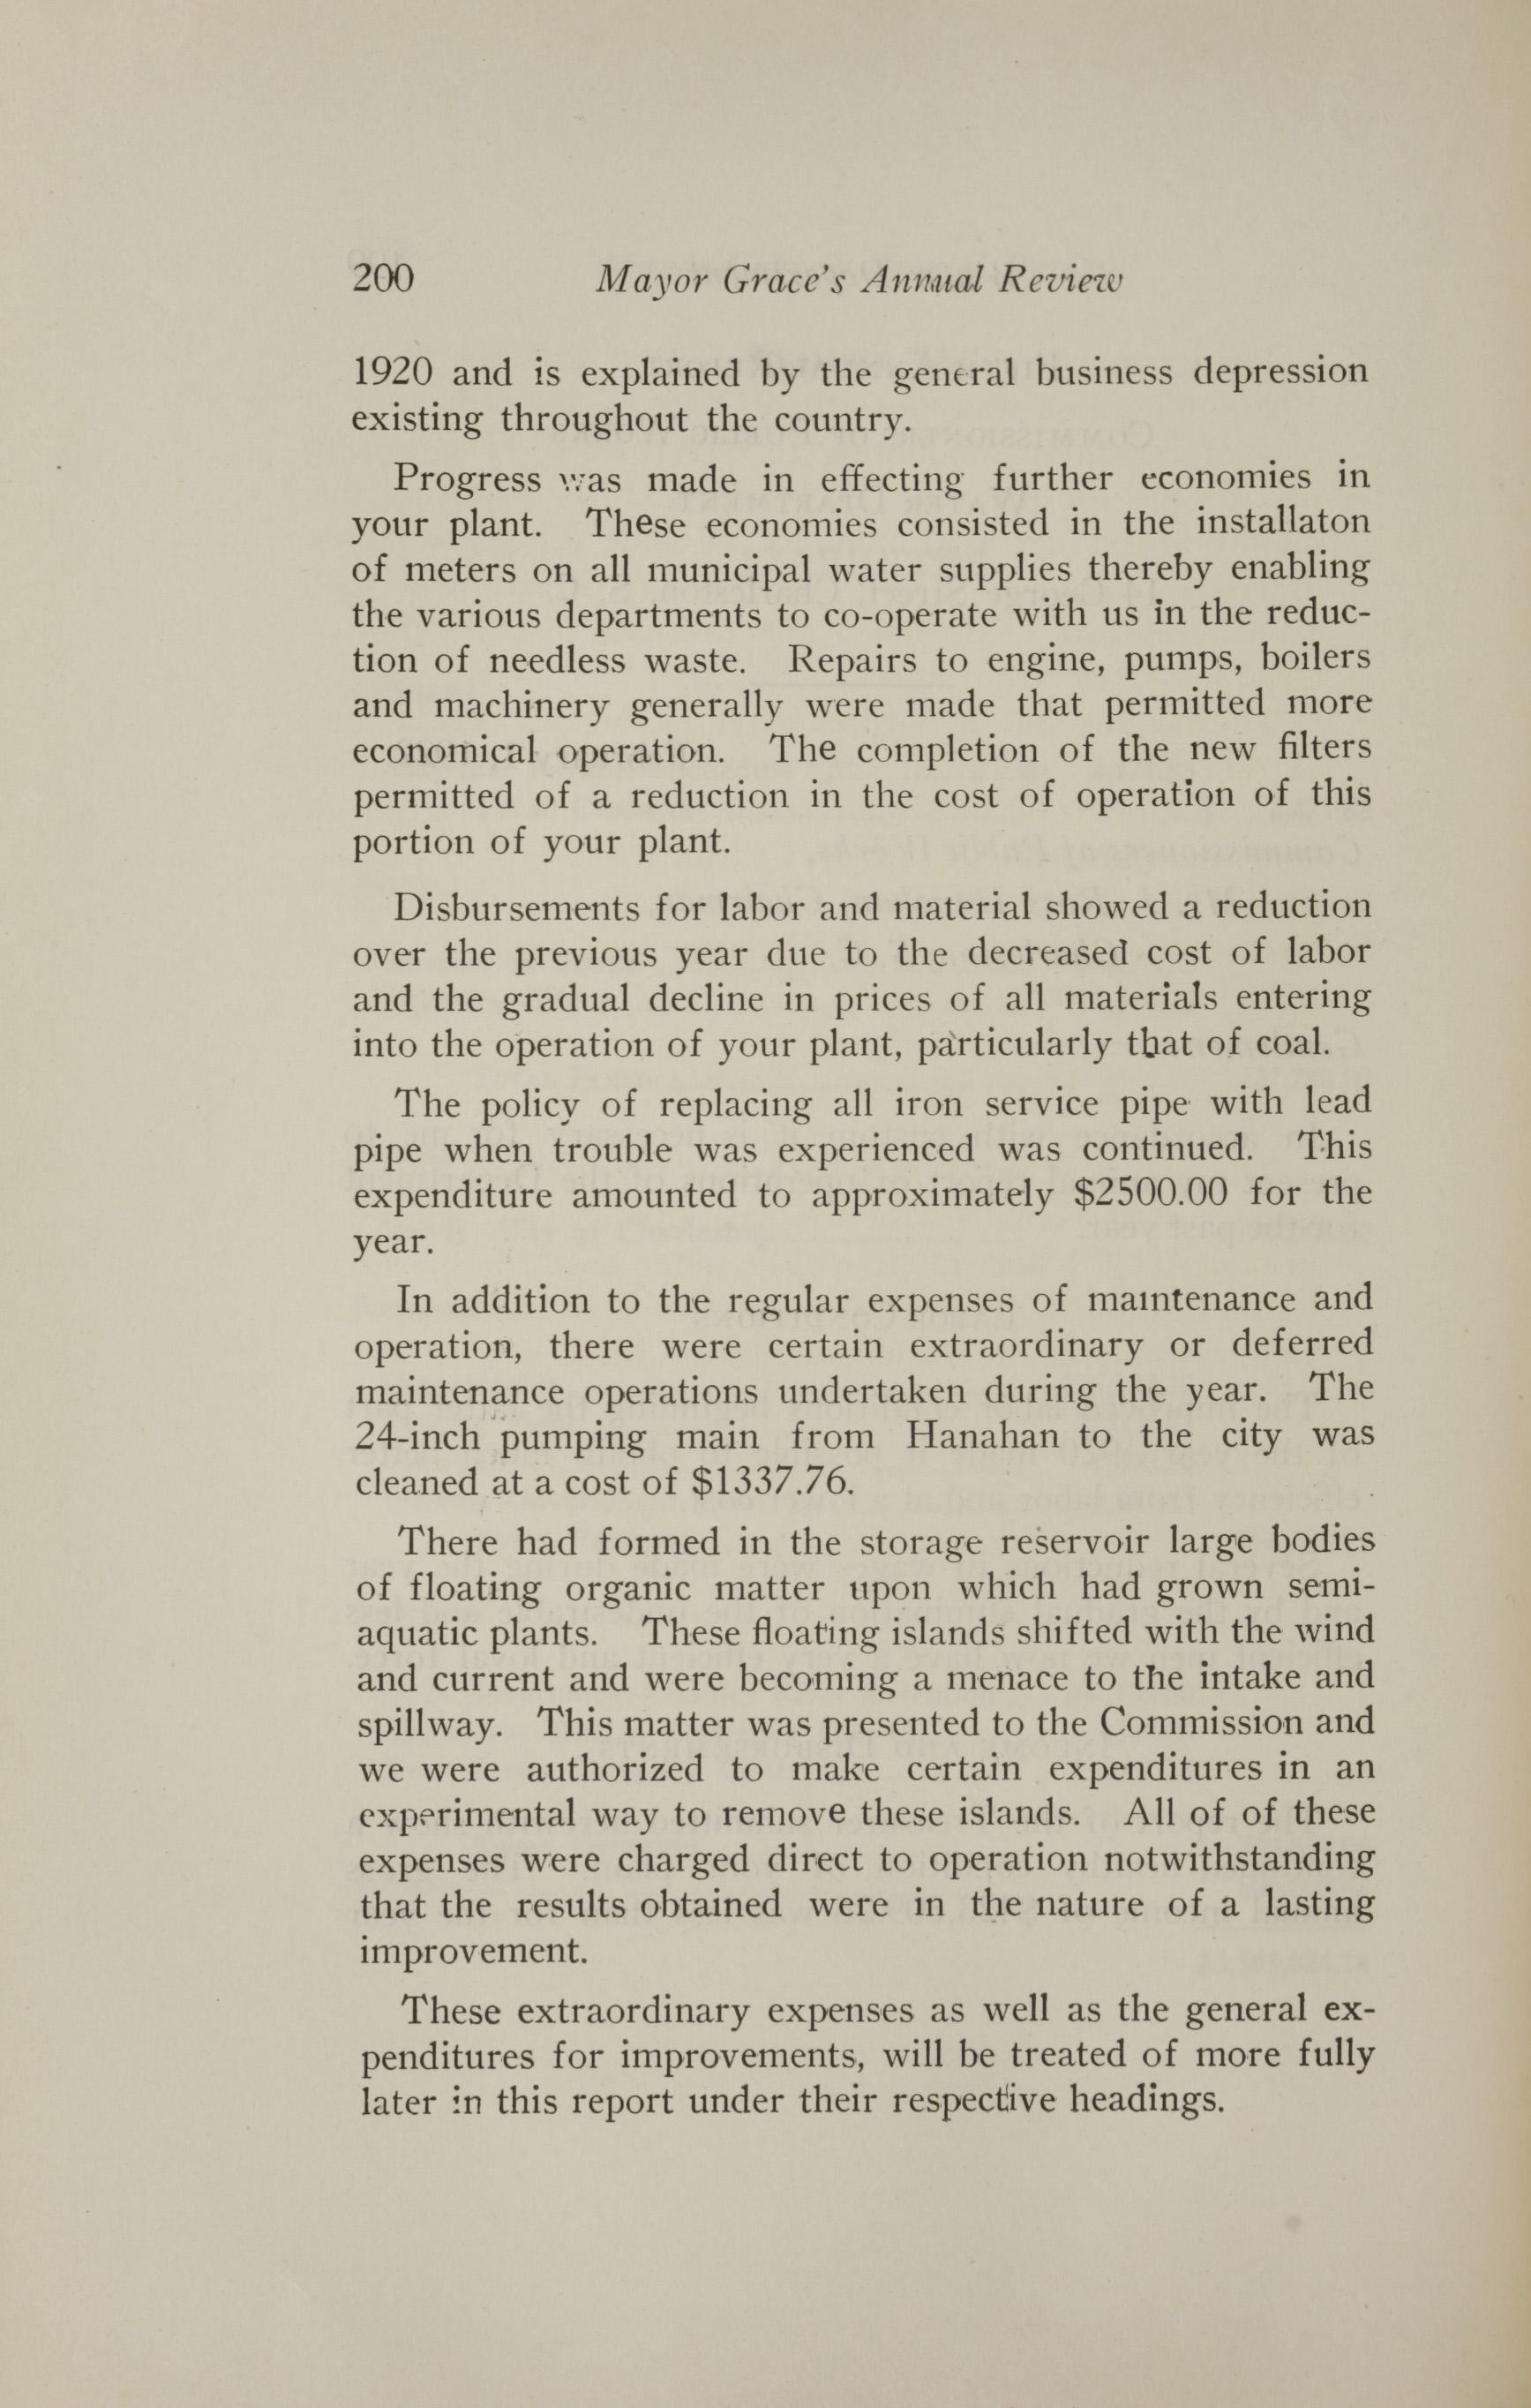 Charleston Yearbook, 1921, page 200